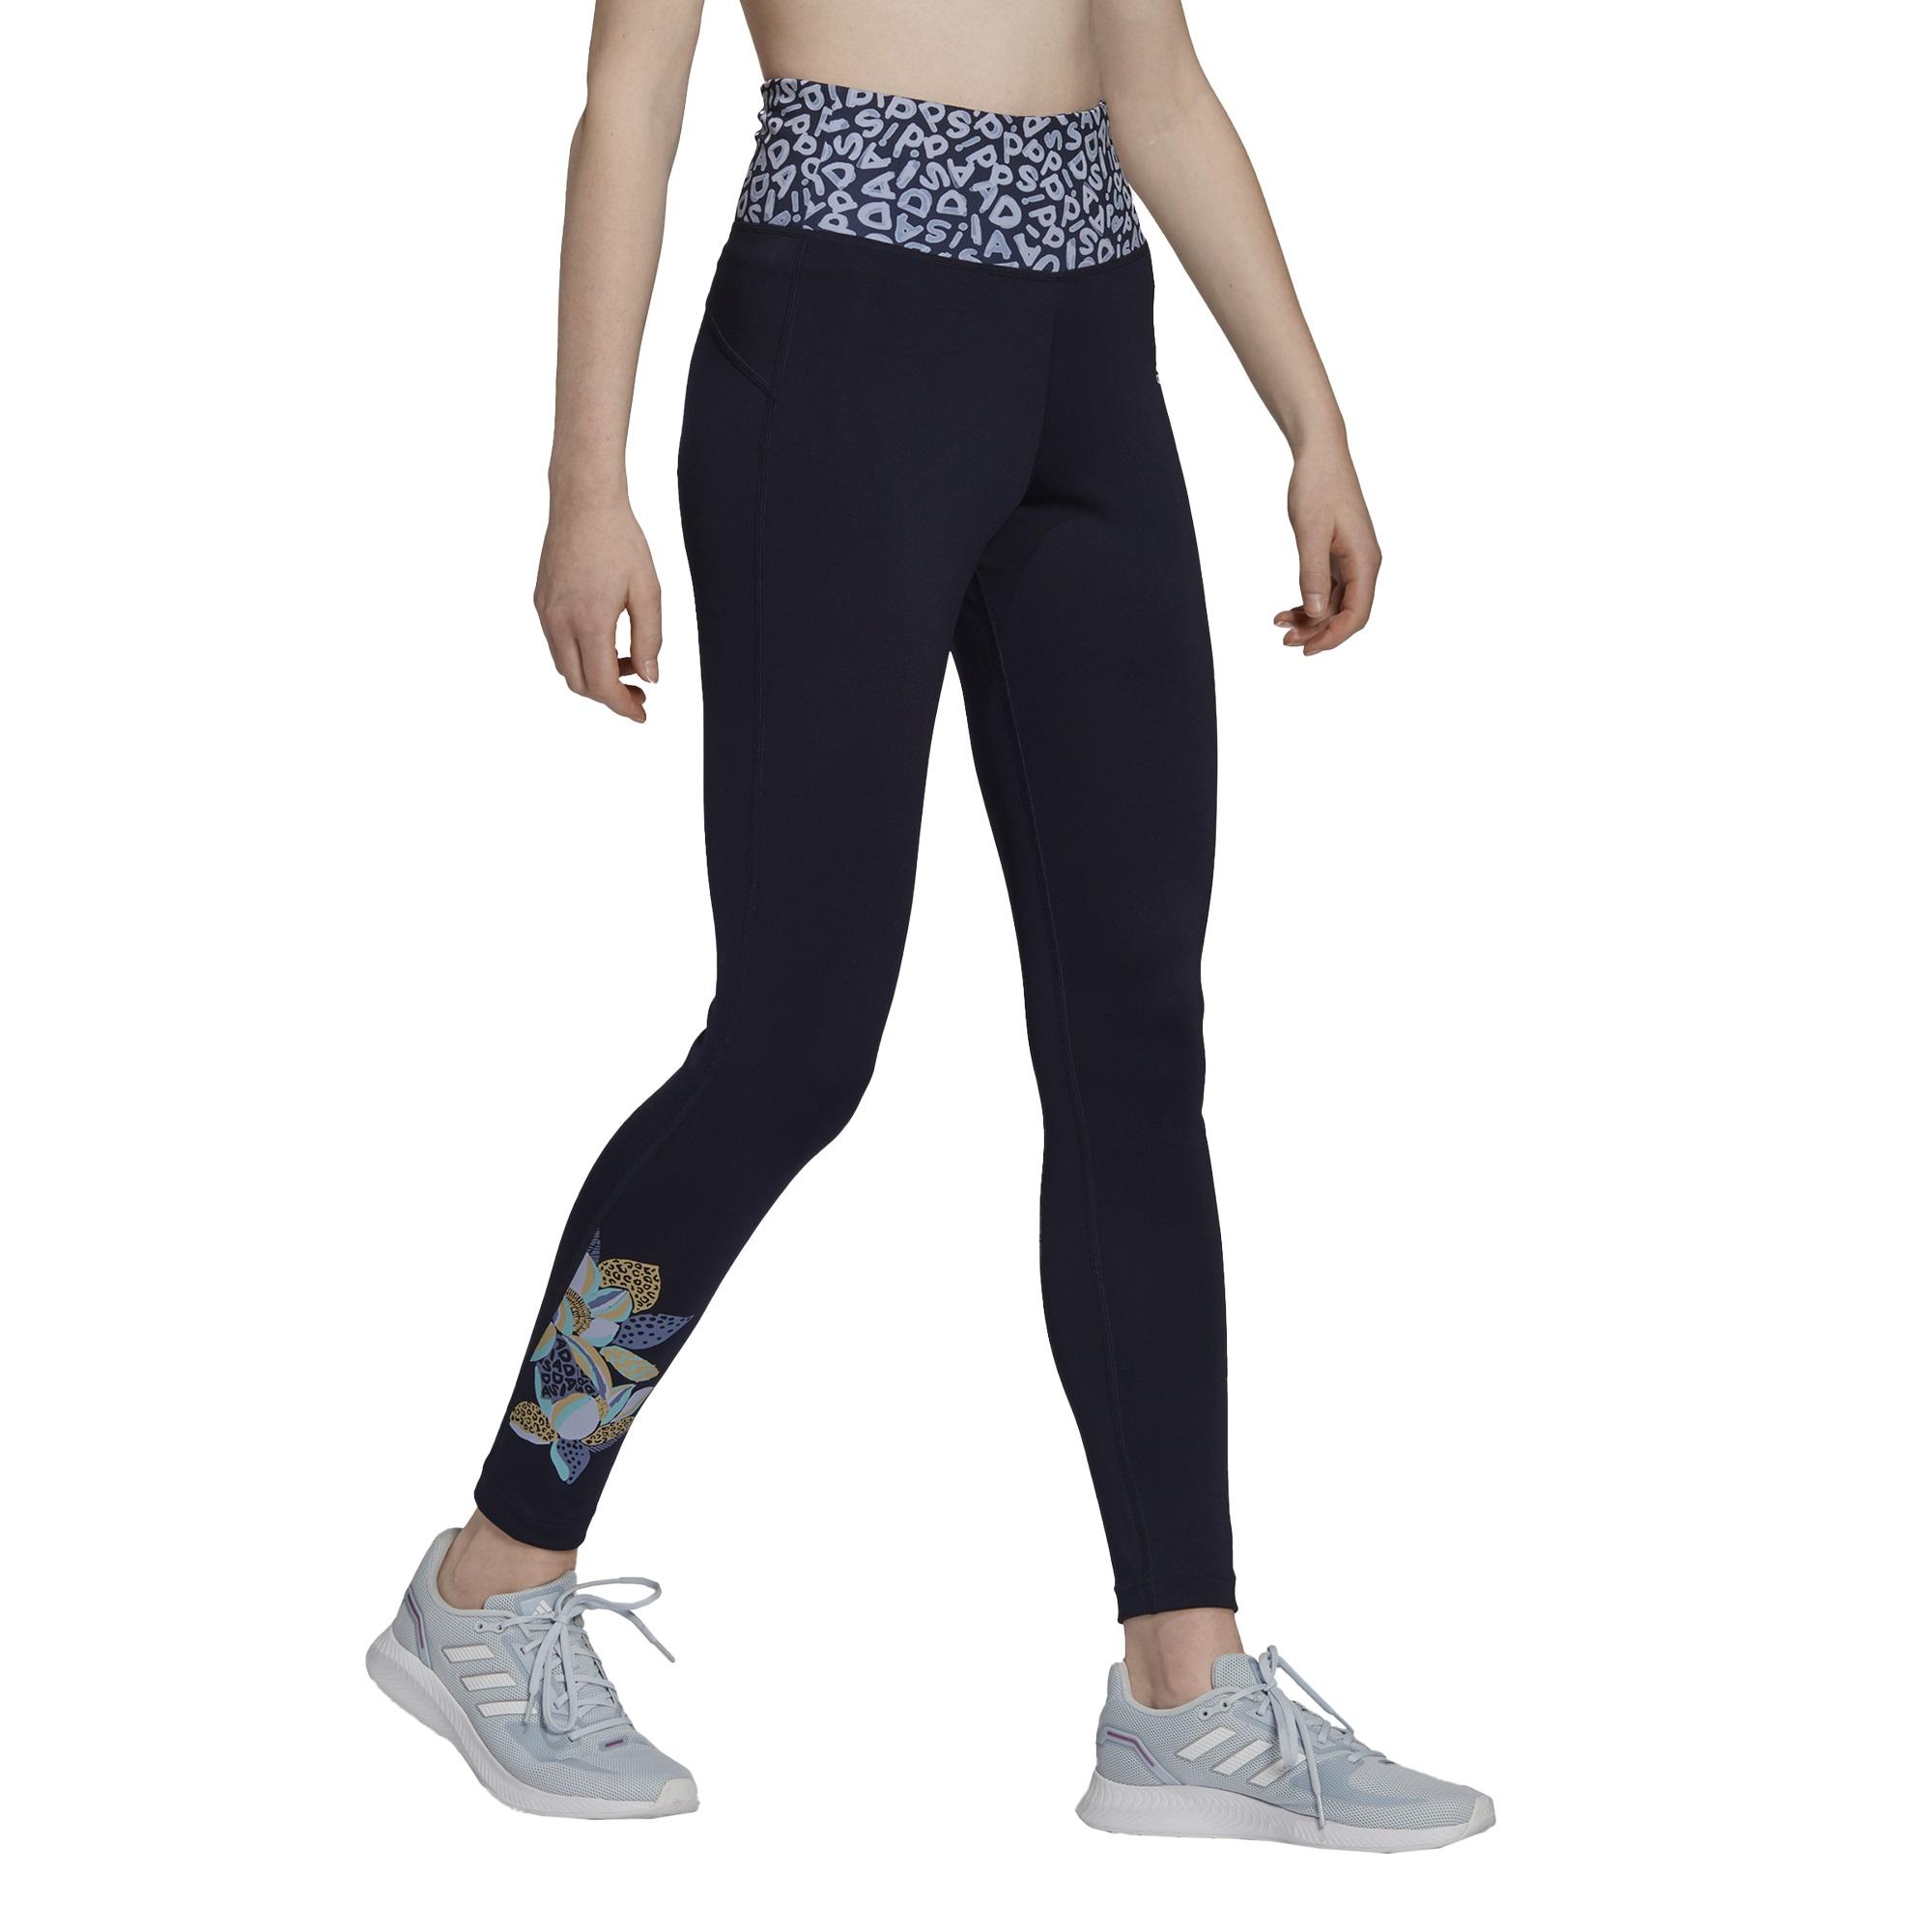 Calça Legging Adidas Farm Feminina